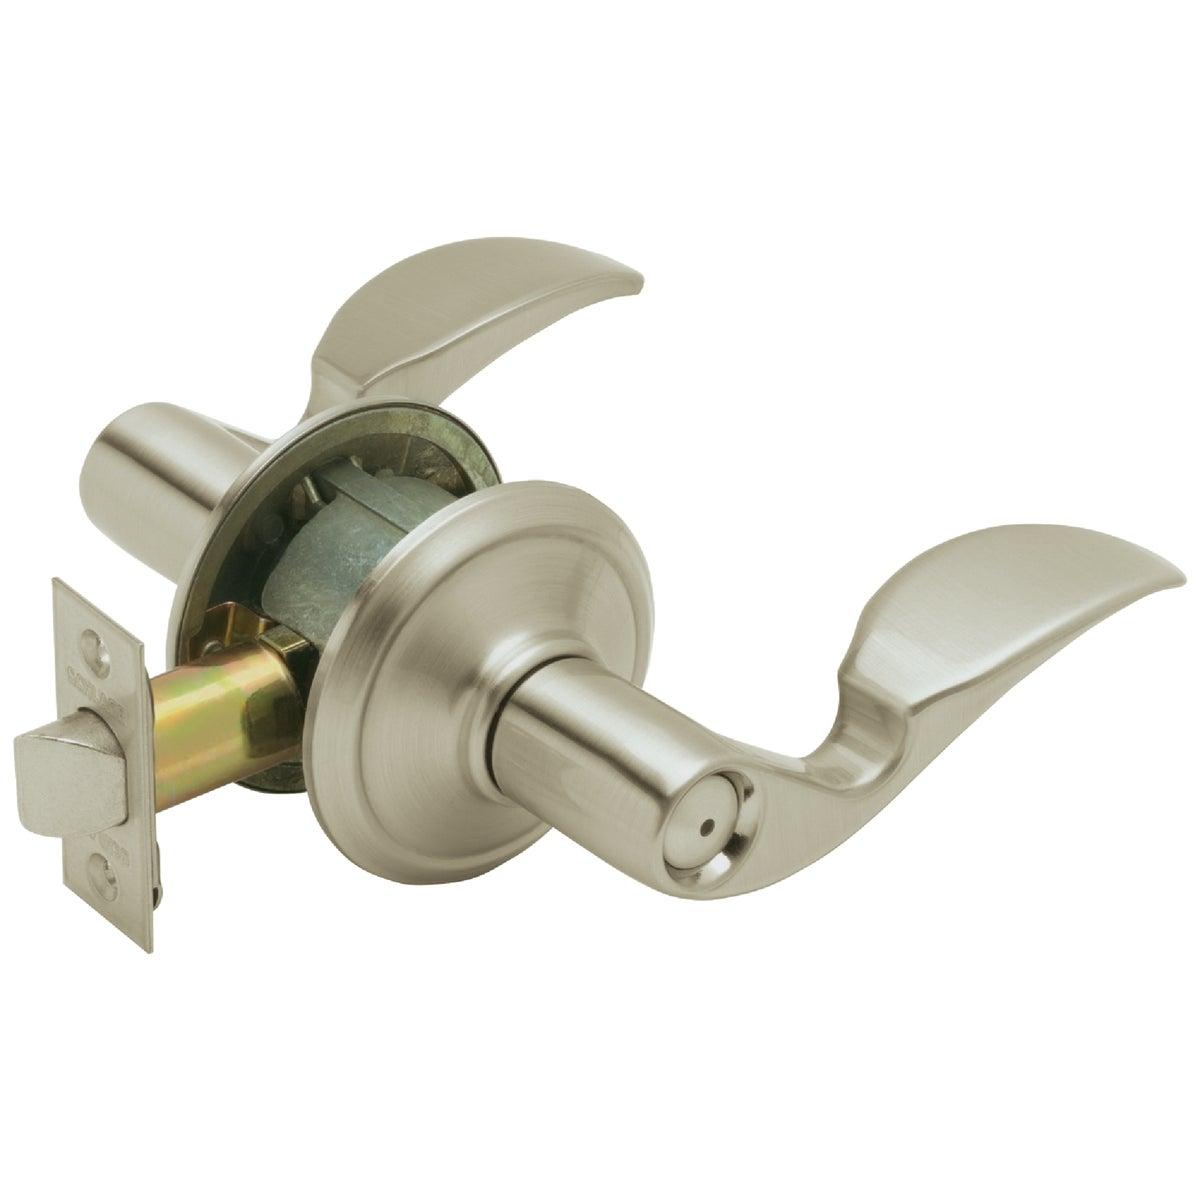 SN AVANTI PRIVACY LEVER - F40VAVA619 by Schlage Lock Co